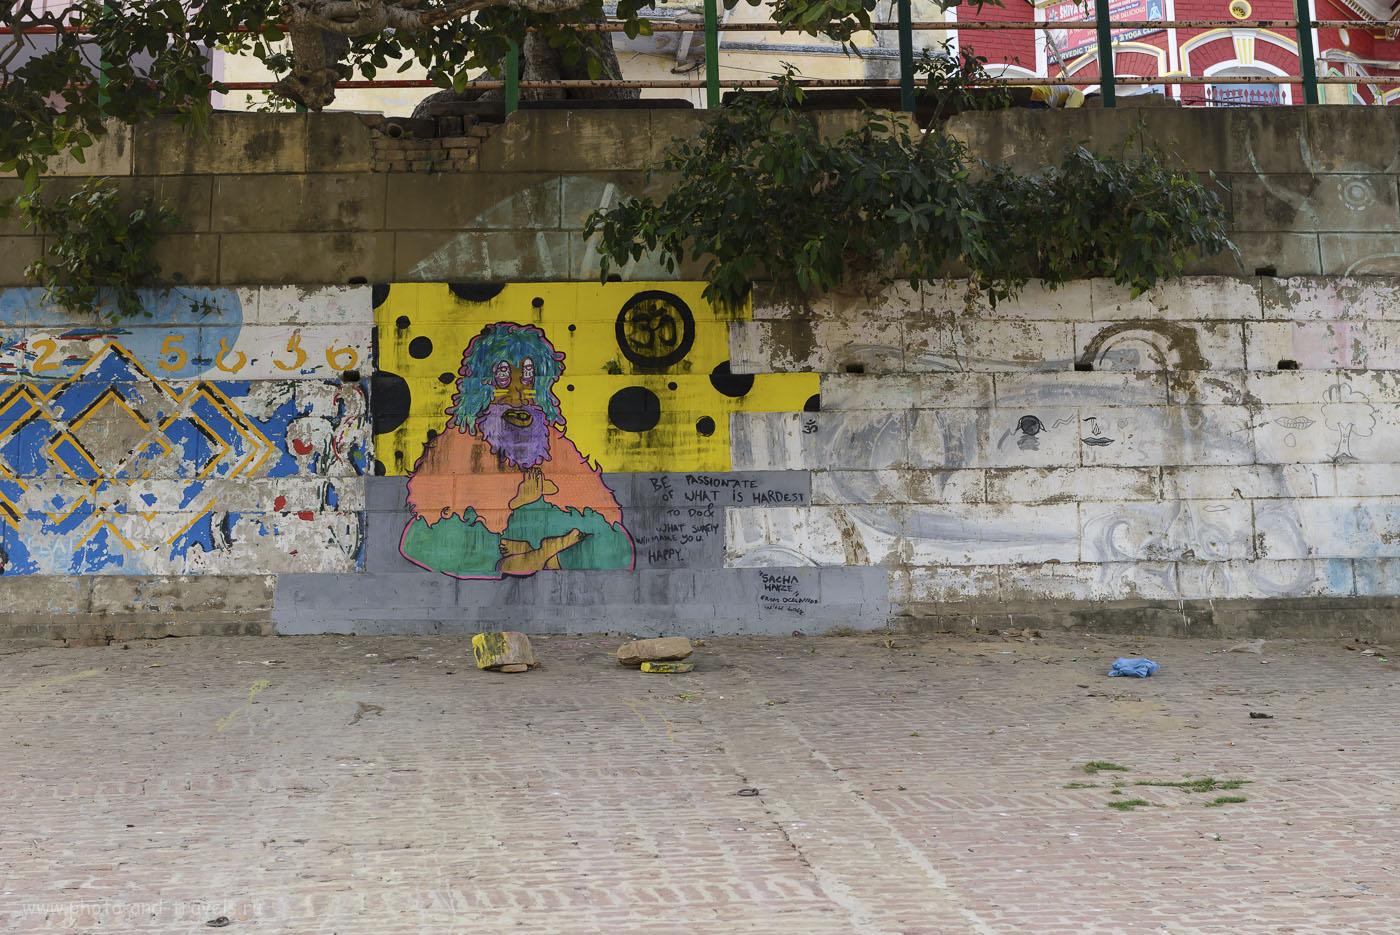 Фотография 6. Прогулка по Варанаси. Отчет о путешествии по Индии. 1/100, 9.0, 250, 60.